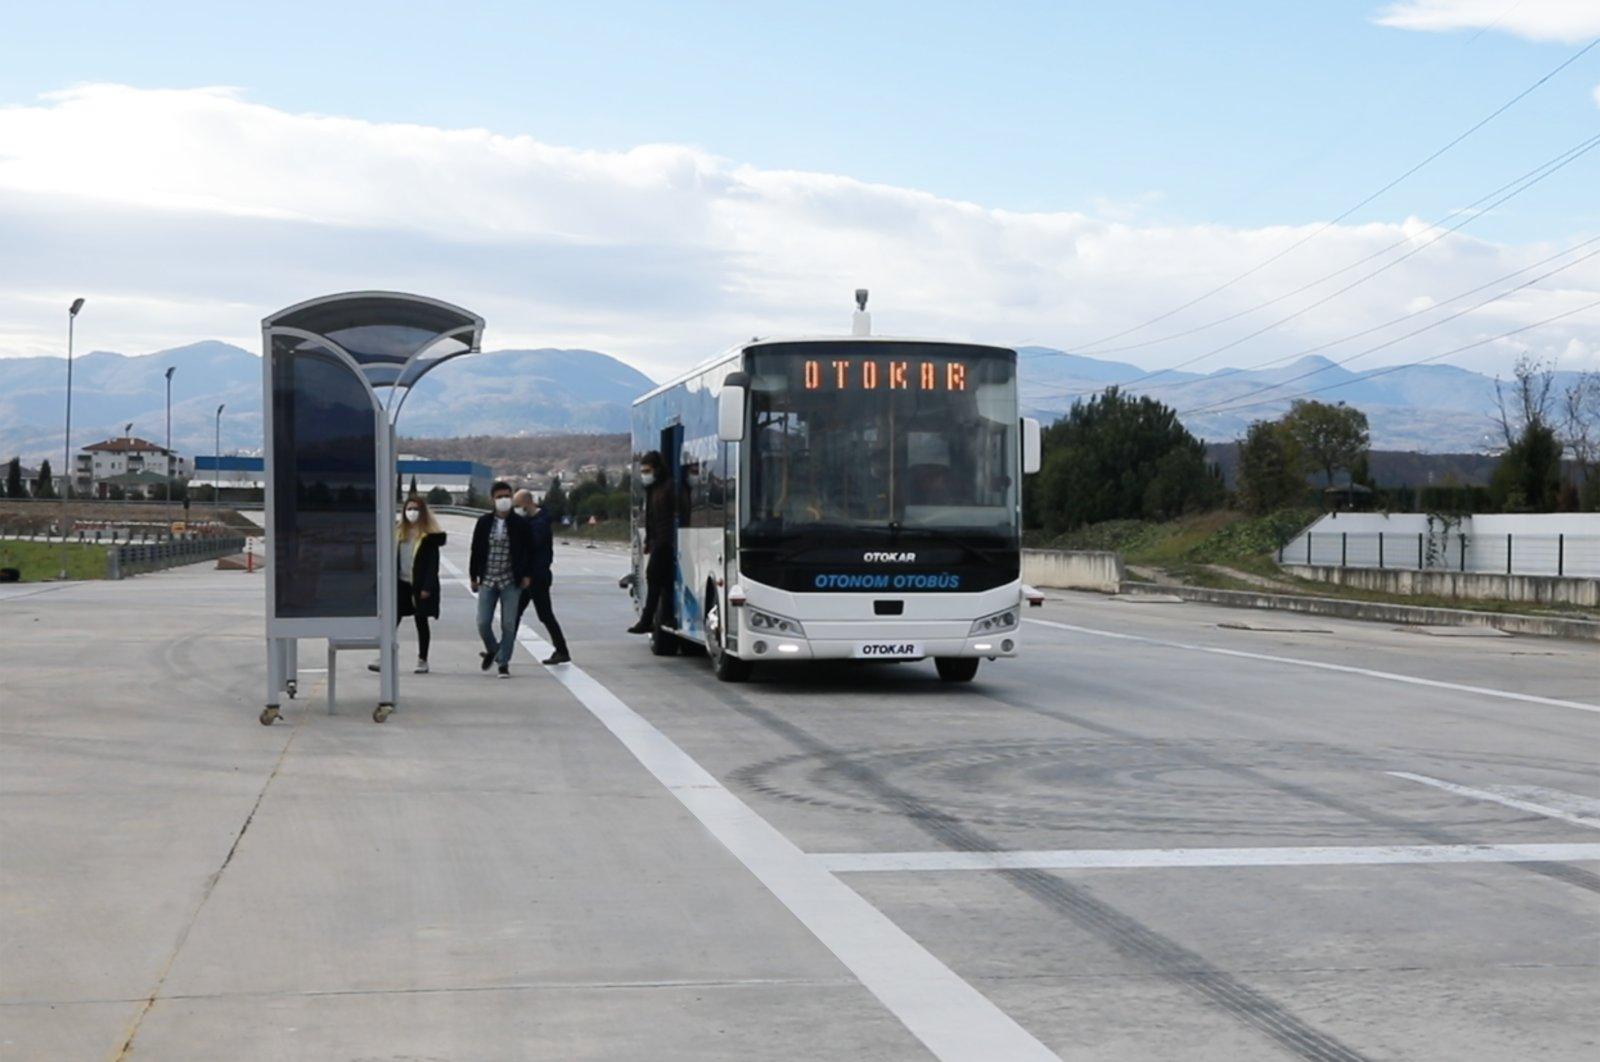 Passengers get off Turkey's first autonomous bus, manufactured by Otokar, Jan. 15, 2021. (Courtesy of Otokar)